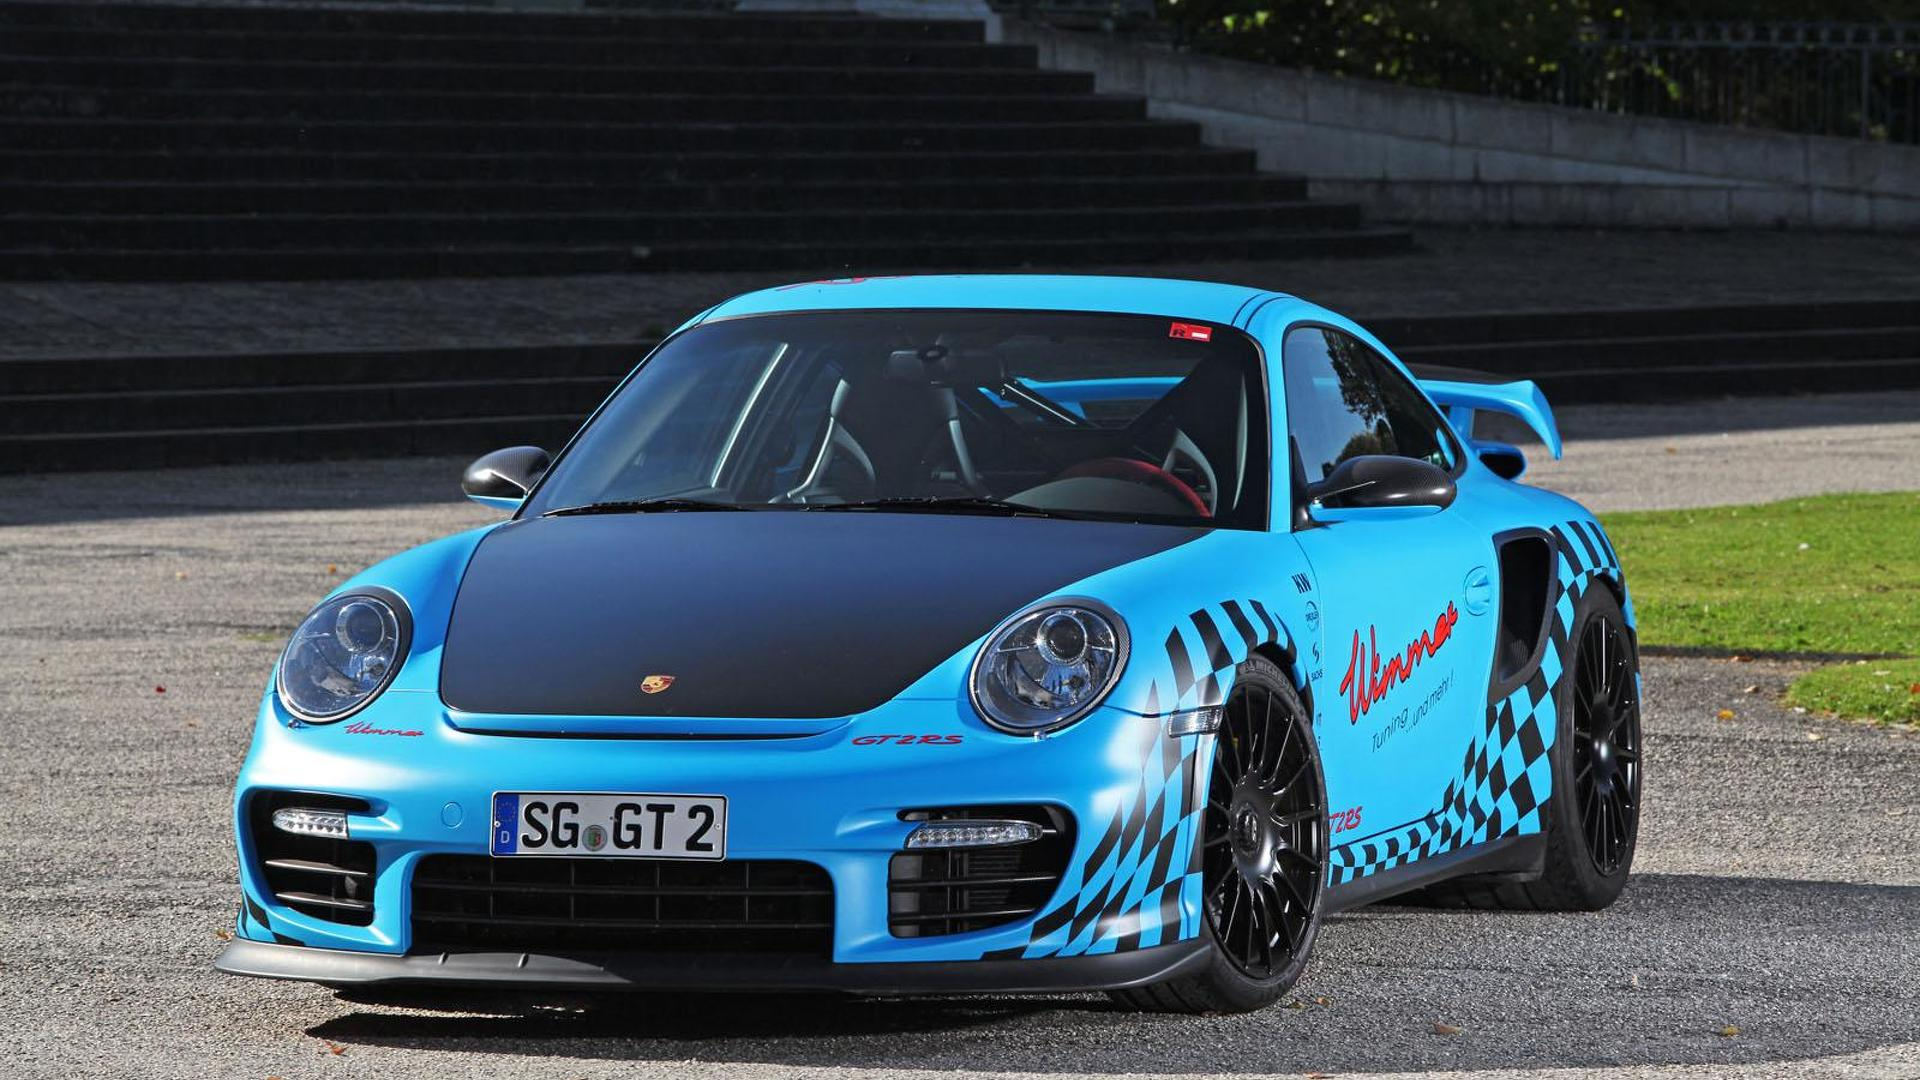 2012-340026-porsche-911-gt2-rs-muscle-play-by-wimmer-rs-23-10-20121 Astounding Porsche 911 Gt2 Rs 2012 Cars Trend